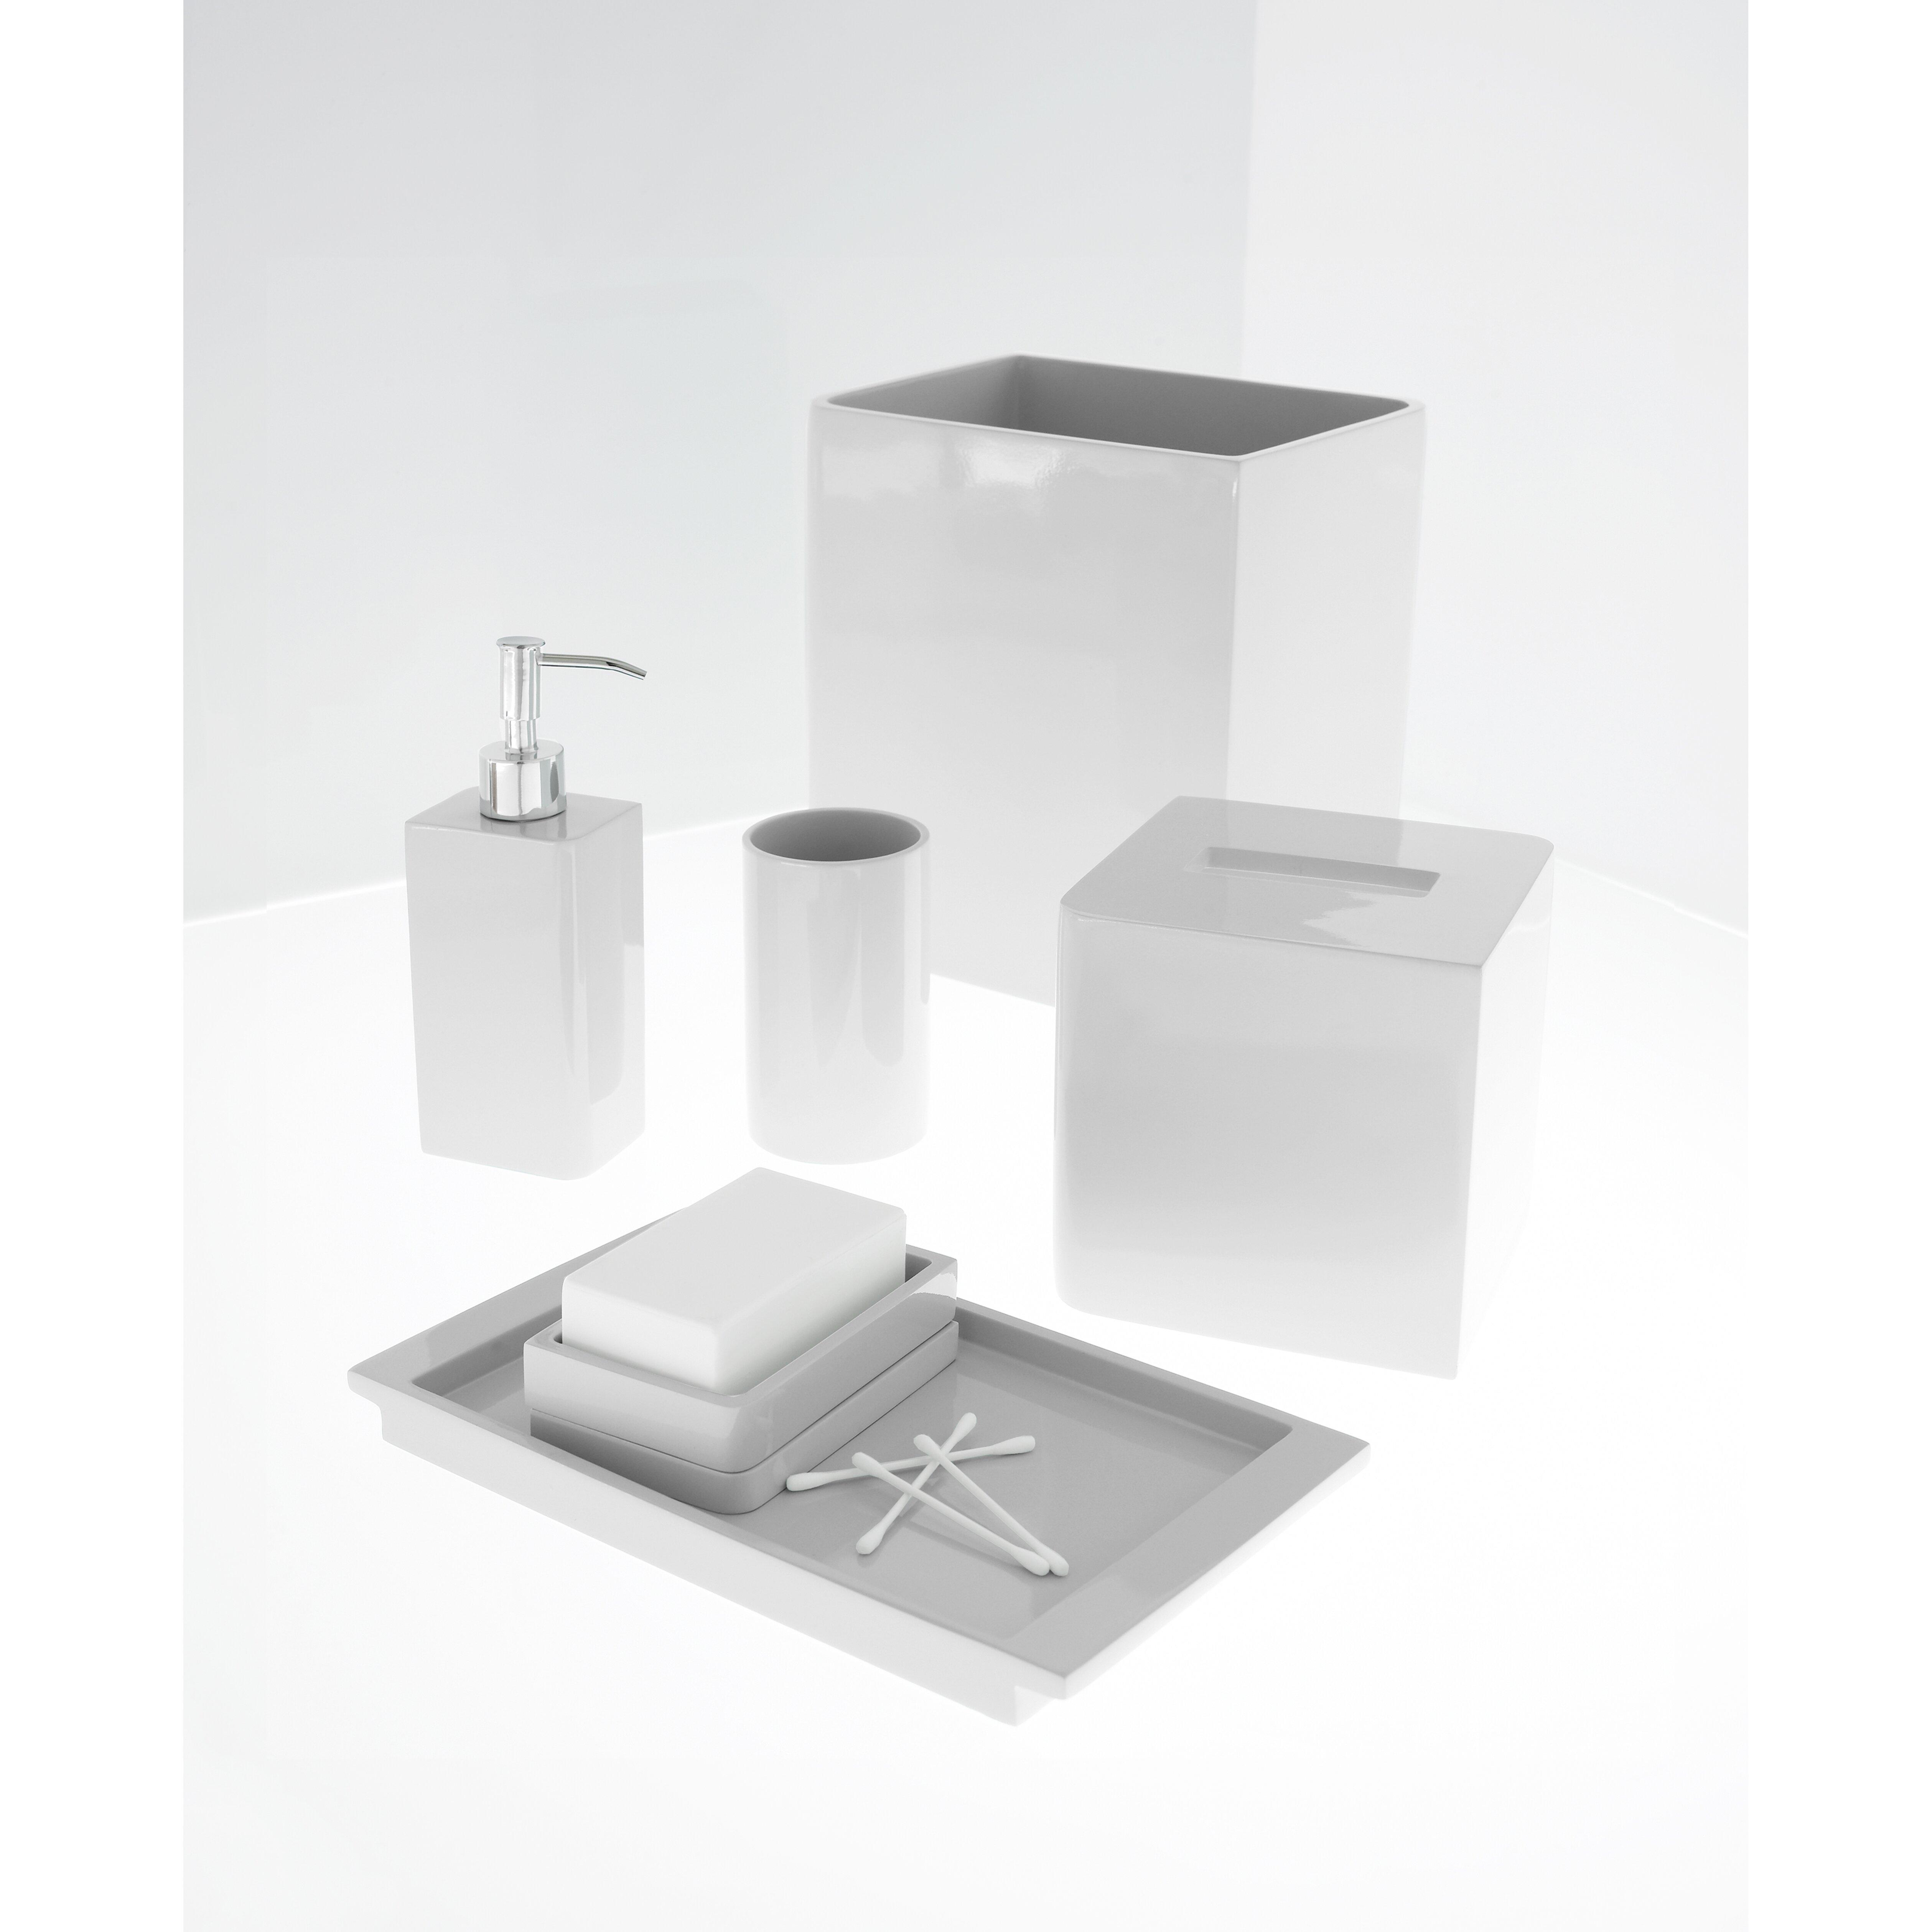 Kassatex lacca soap dispenser reviews wayfair for Bath ensembles